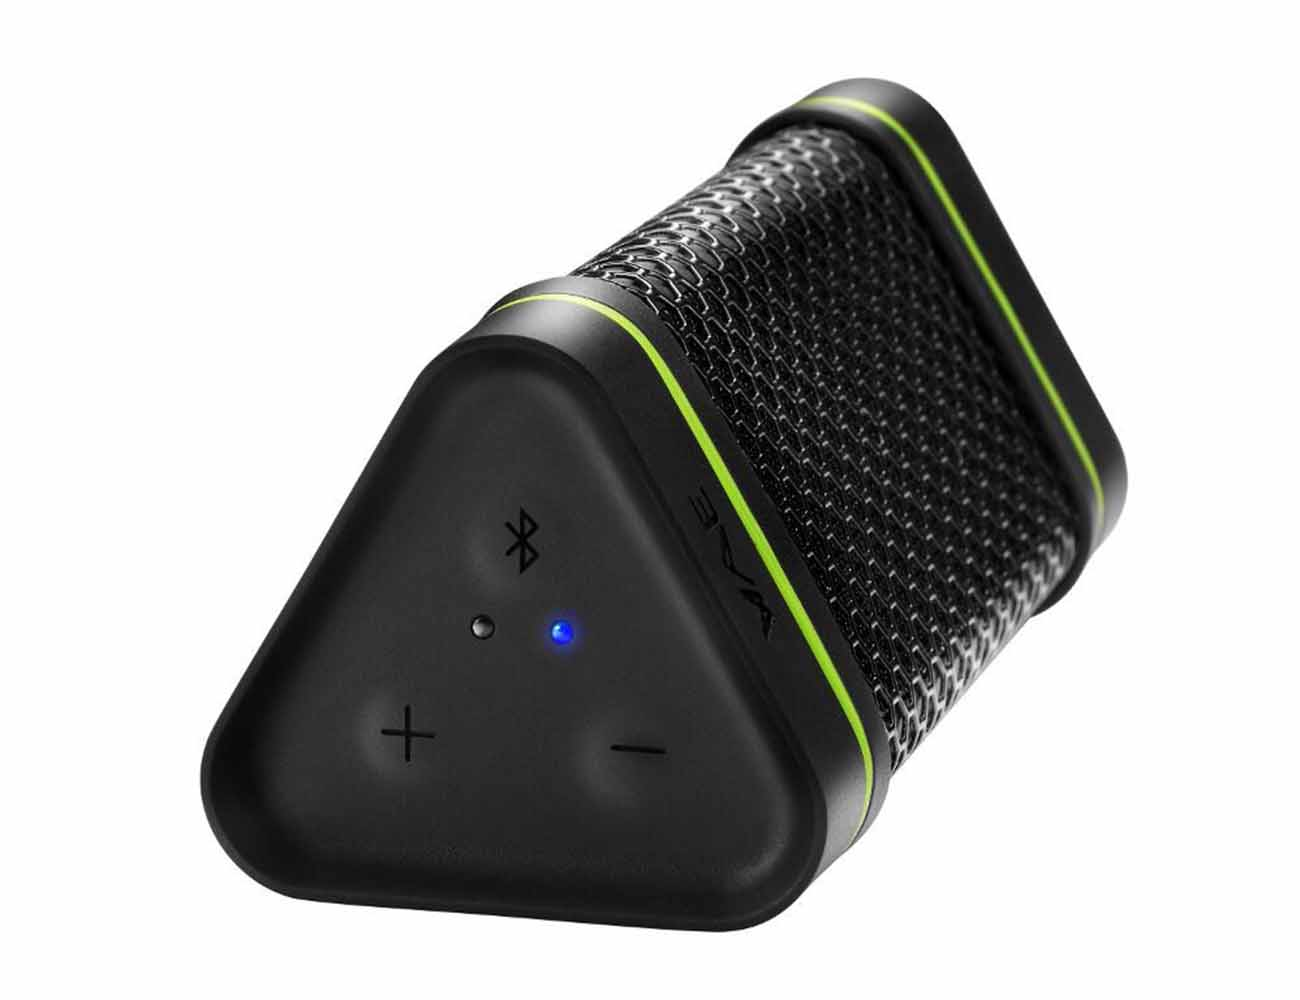 Hercules – IP64 Certified Wireless Speaker